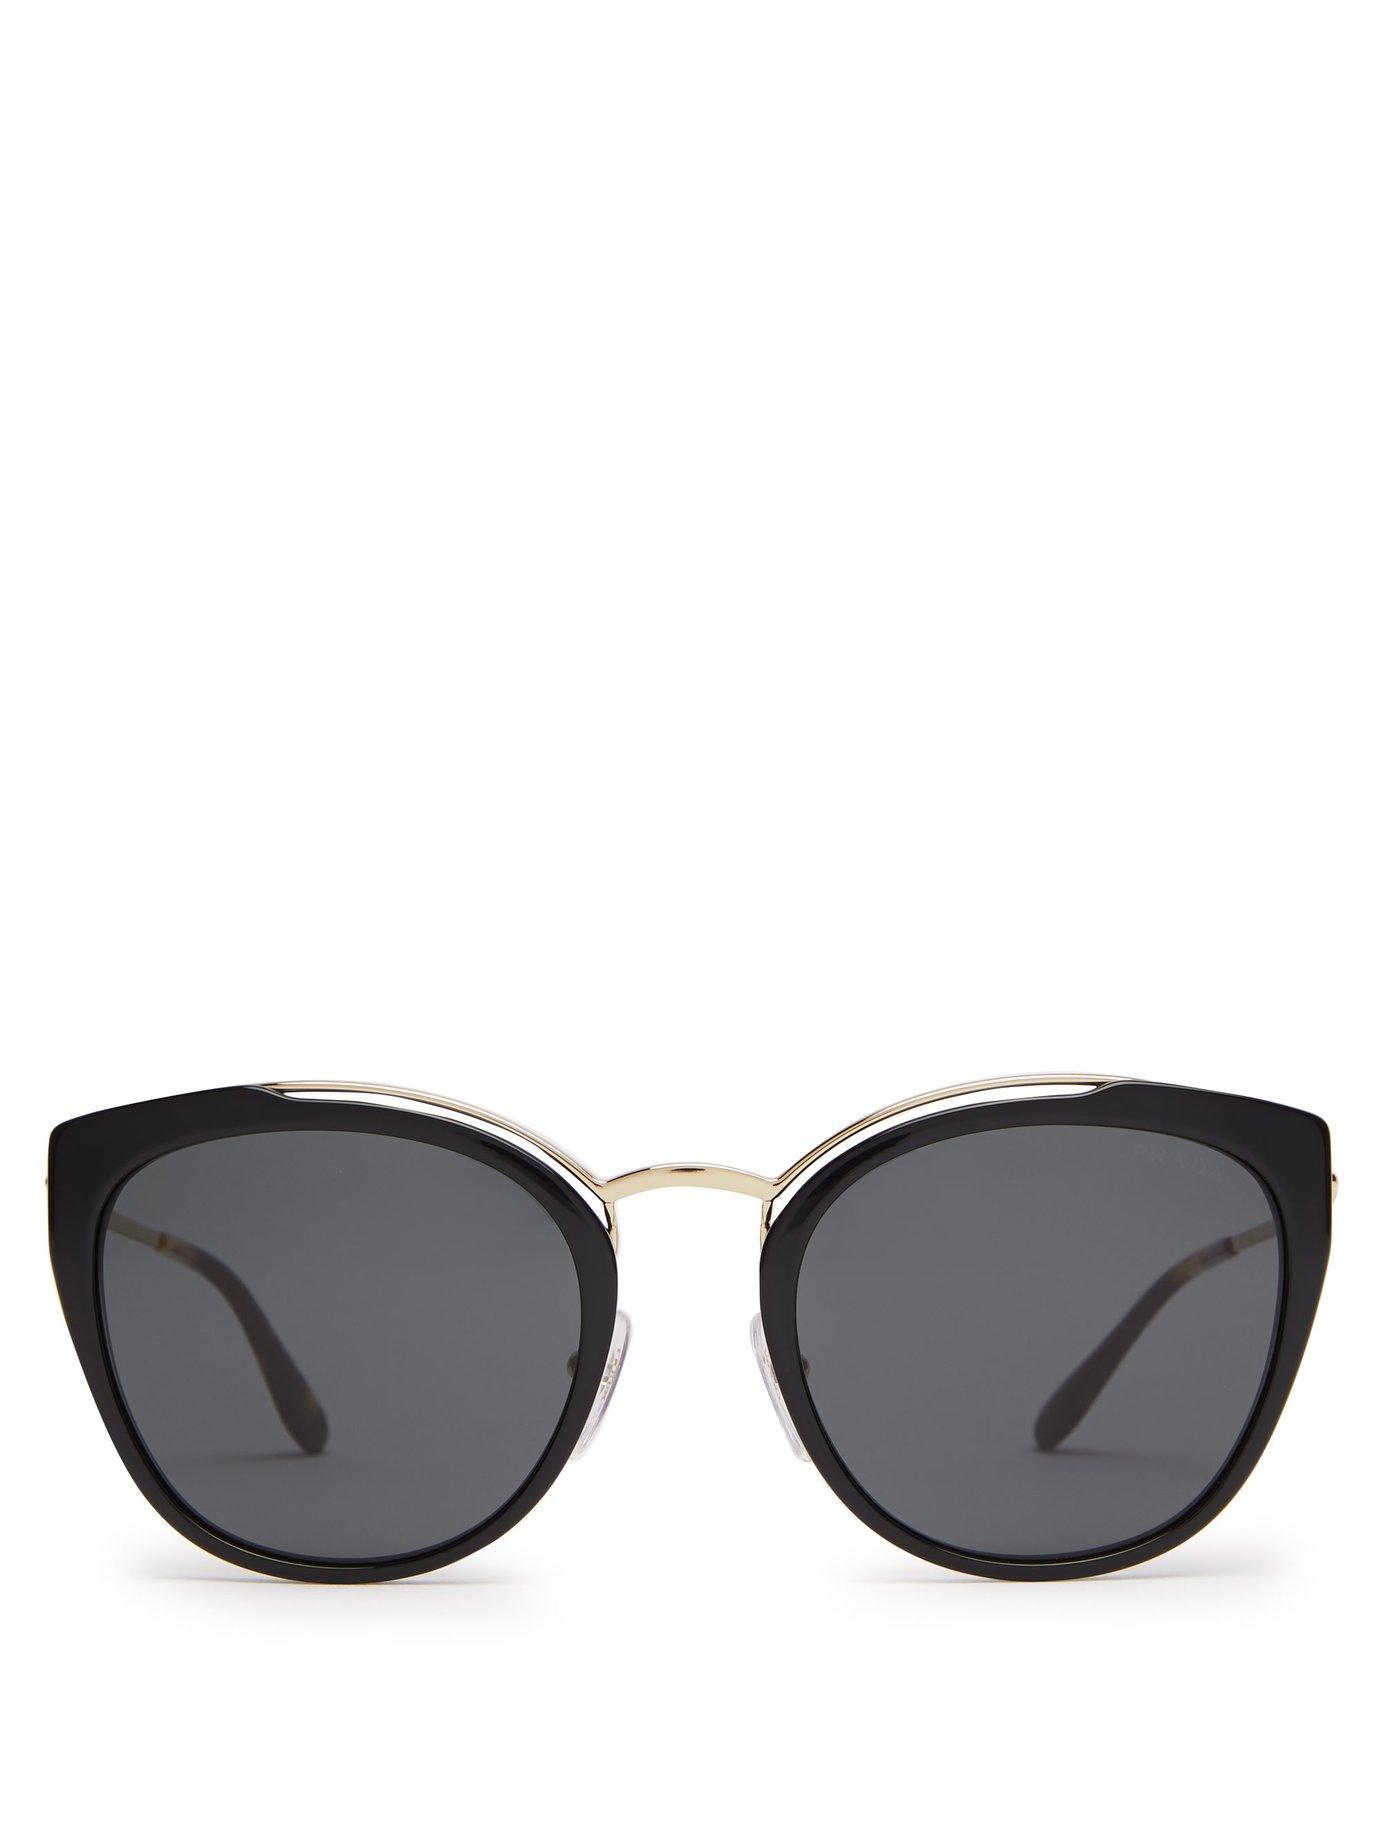 bee635f81f58a Lyst - Prada Cat Eye Acetate And Metal Sunglasses in Black